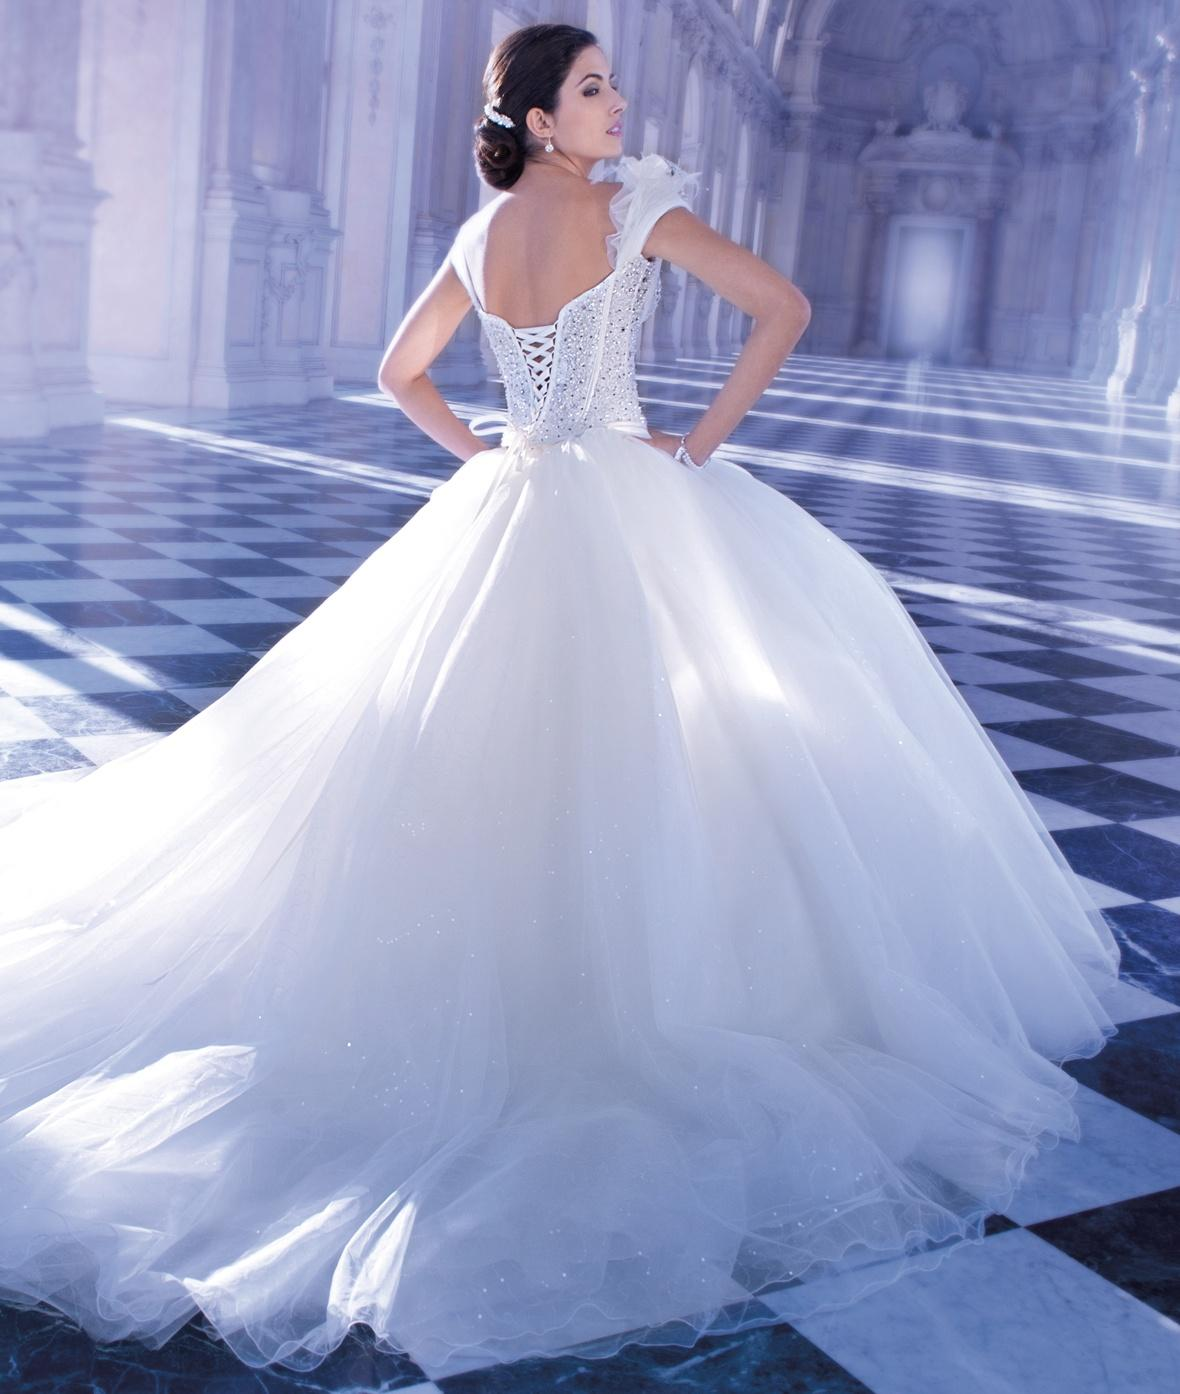 2016 young brides wedding dresses demetrios sweetheart for Wedding dresses for young brides